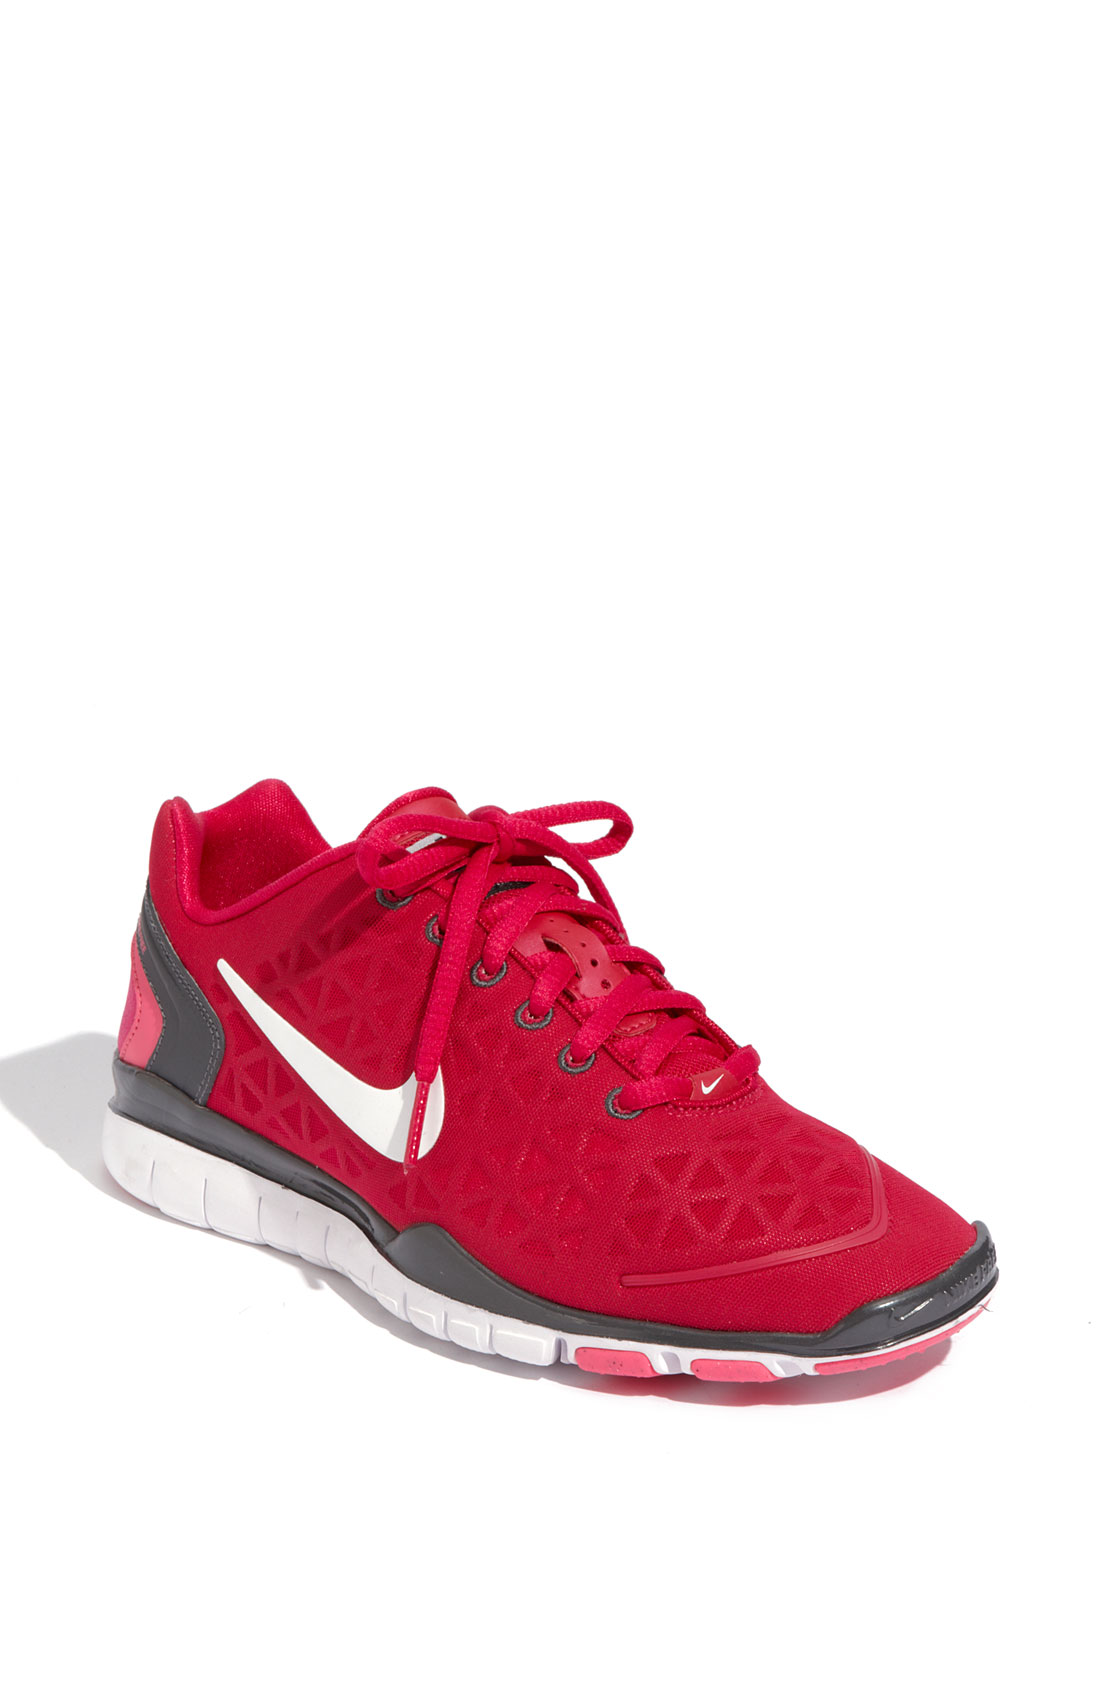 Nike Free Tr Fit 2 - Women's